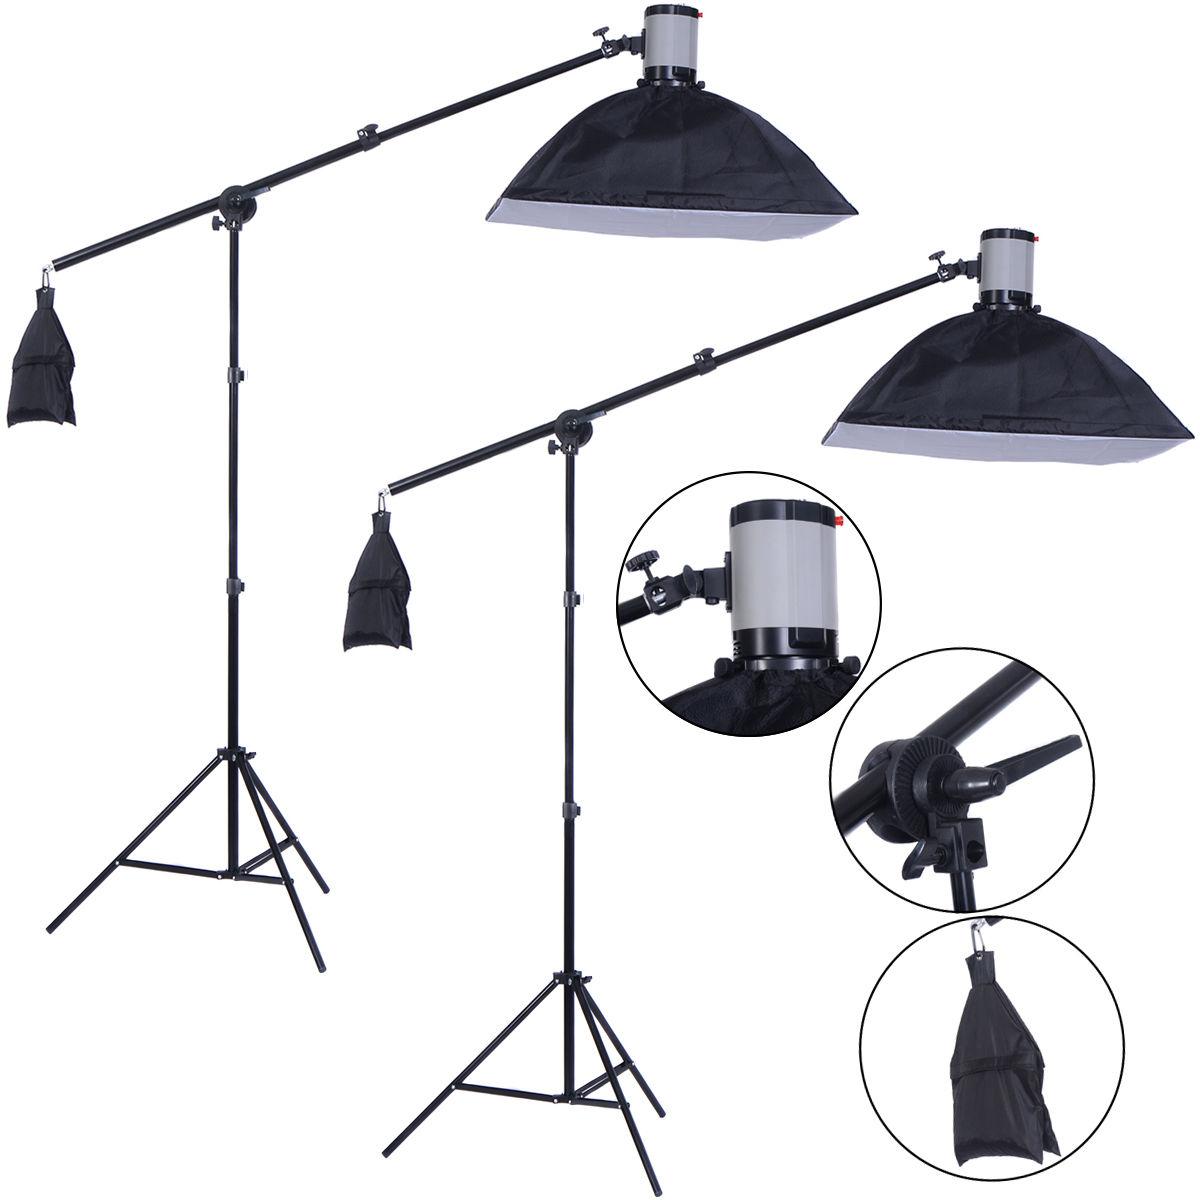 2 X 160W Photography Lighting Studio Flash Light Softbox